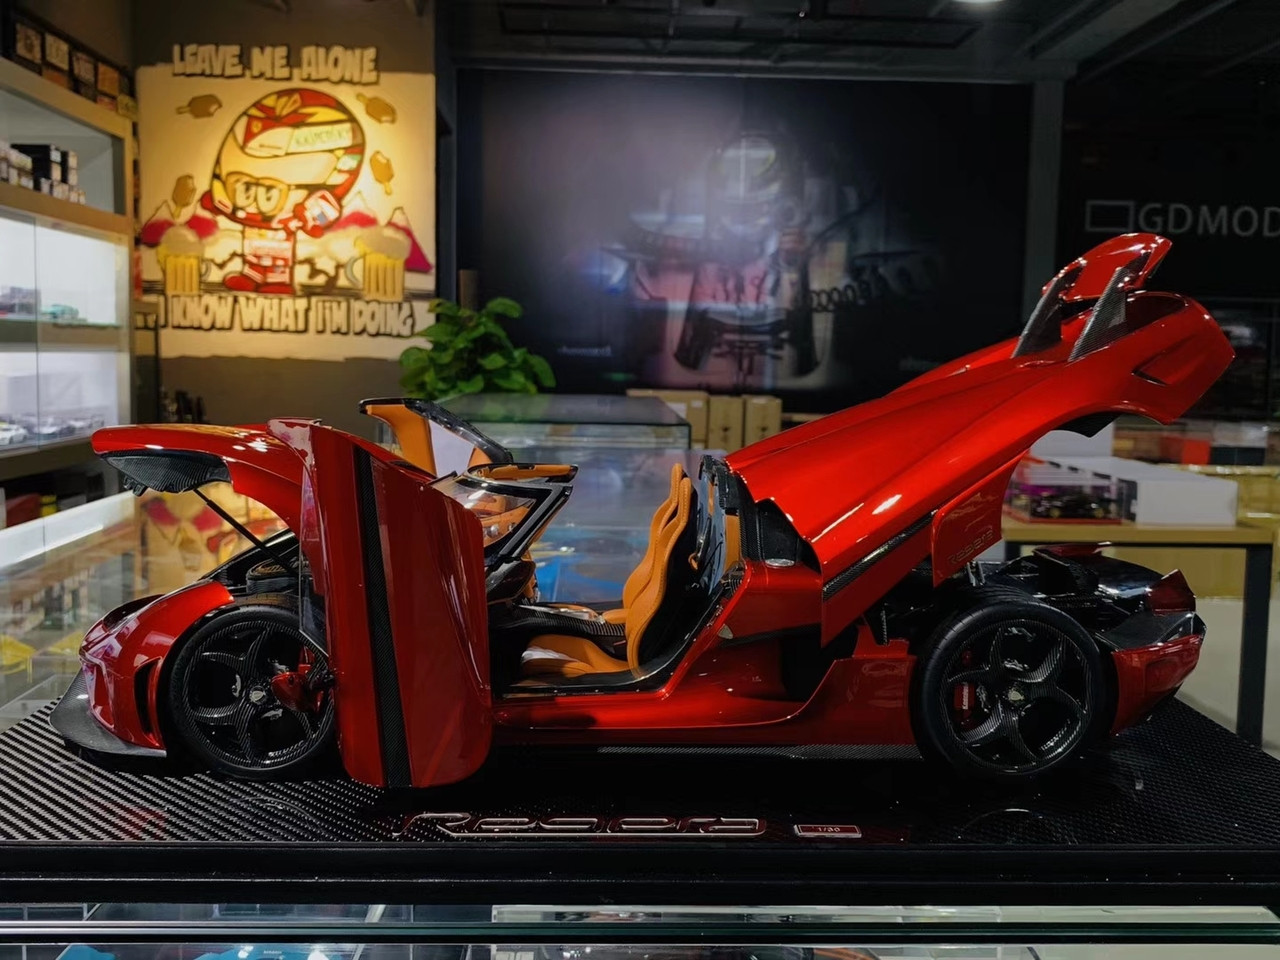 1/8 Frontiart FA Koenigsegg Regera (Red) Serial No.1 Fully Open Car Model w/ Lights